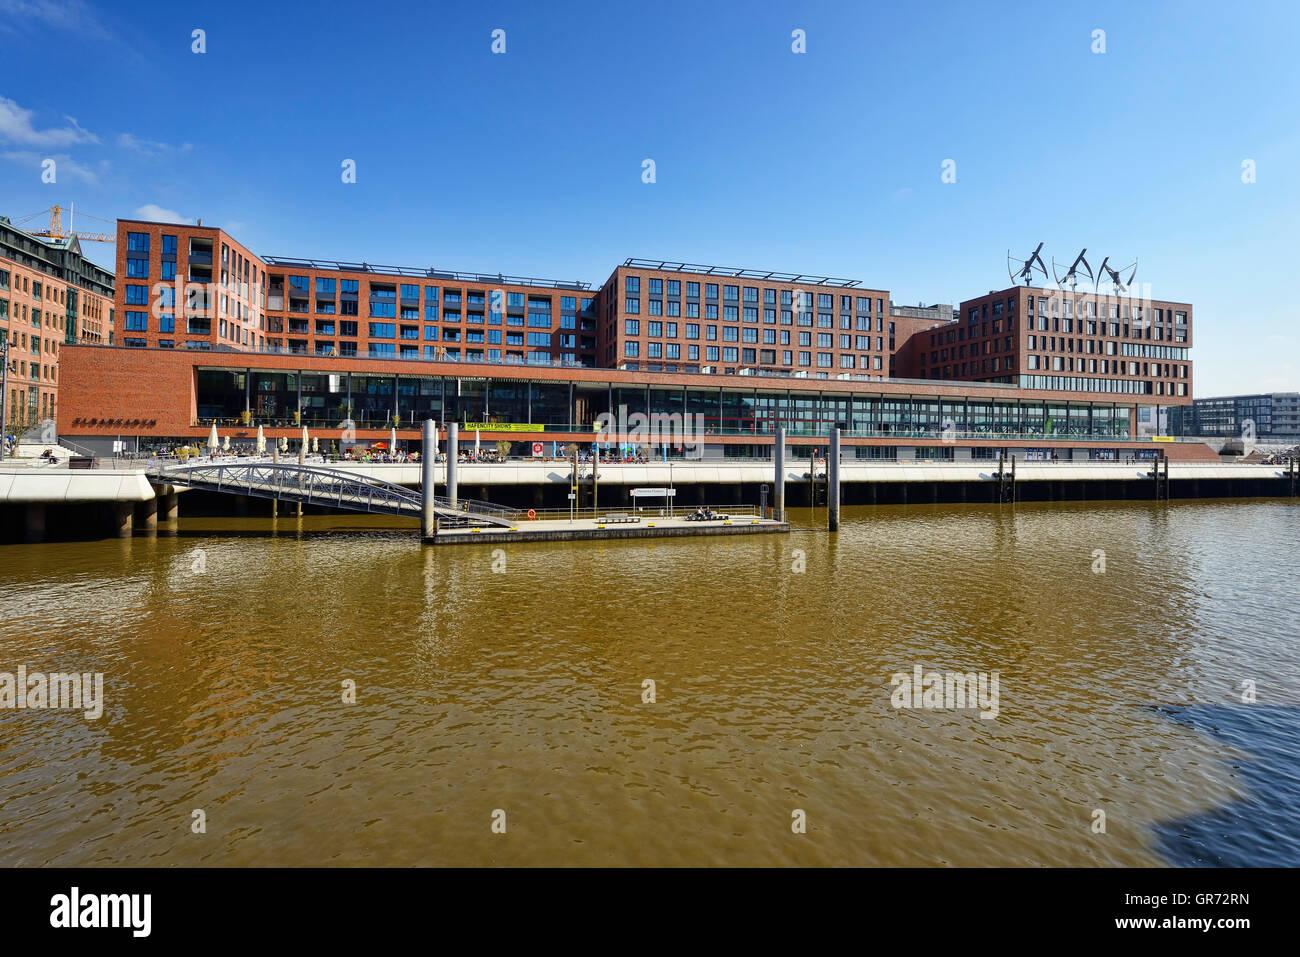 Elbarkaden Office Building In Hamburg, Germany - Stock Image